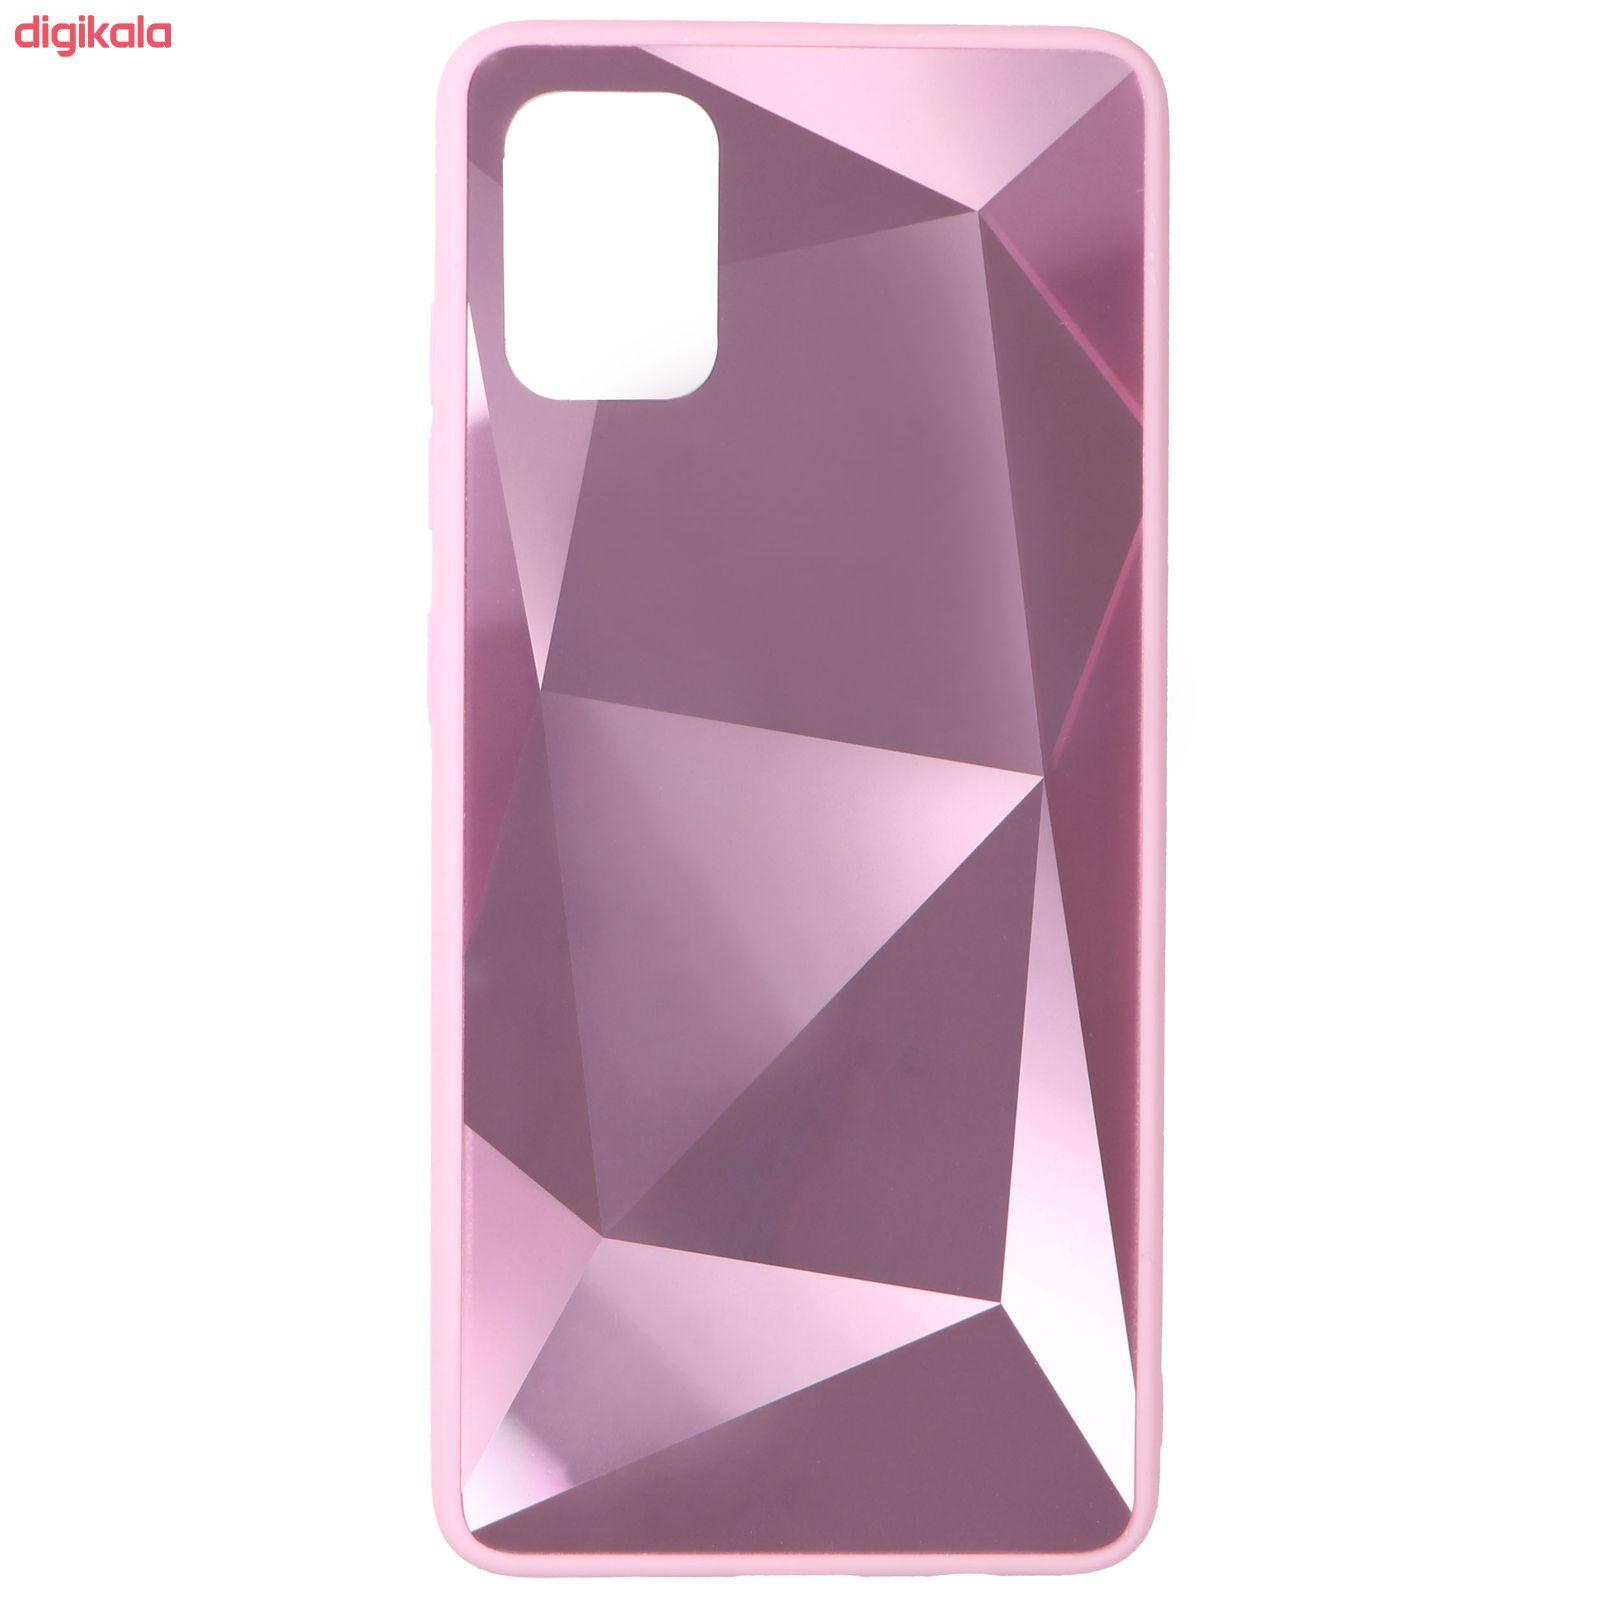 کاور مدل a-1 طرح الماس مناسب برای گوشی موبایل سامسونگ Galaxy A51  main 1 1